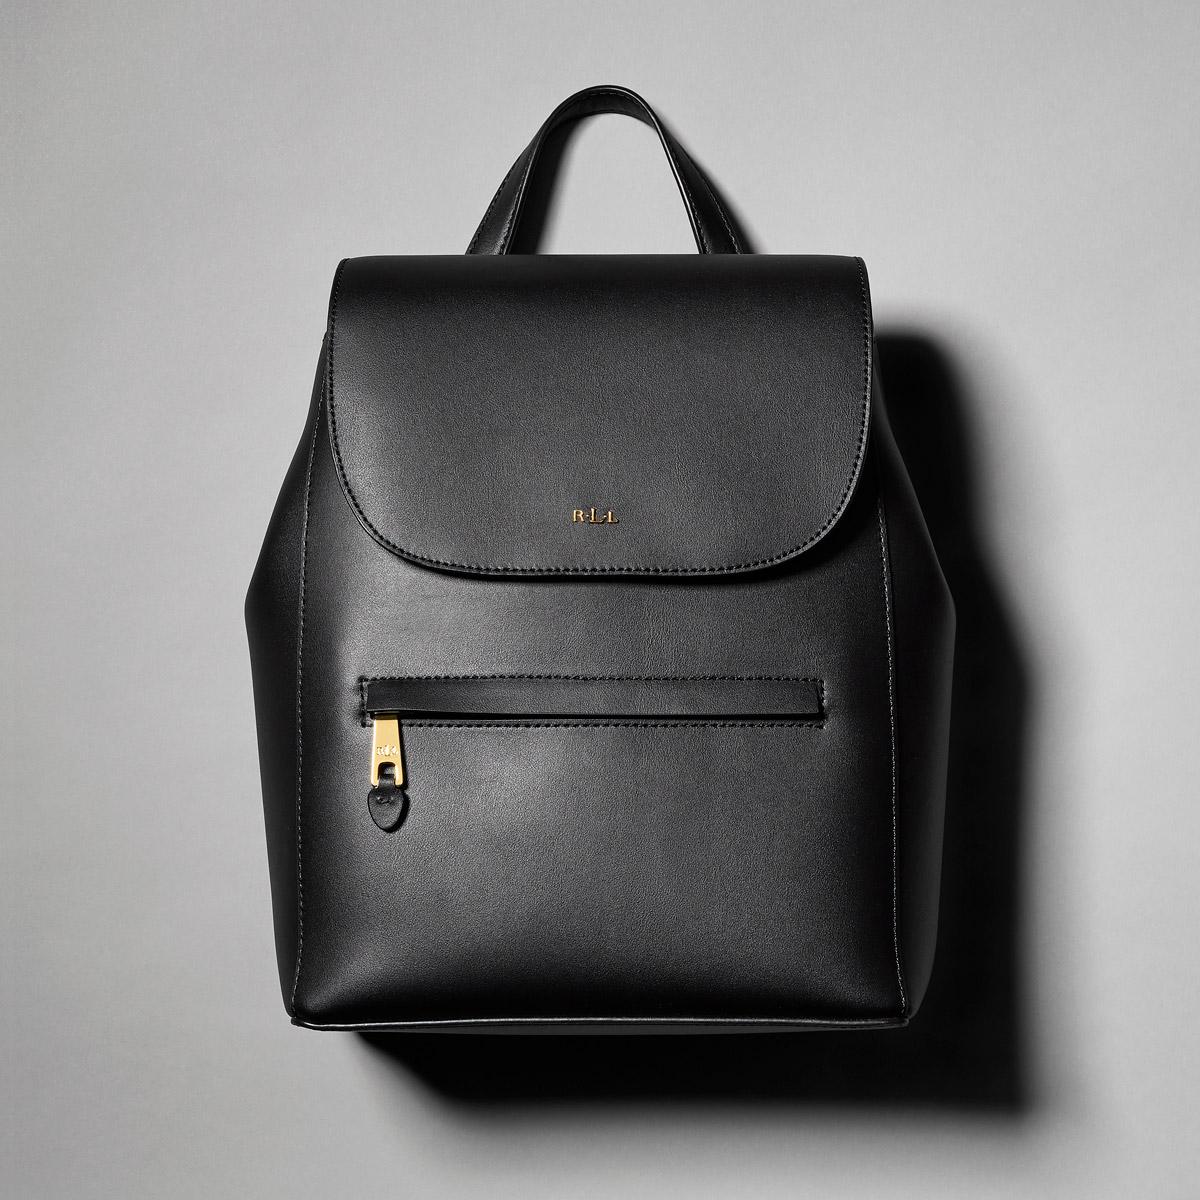 Ralf-Lauren-Bag-fashion-product-photographer-ben-appleby.jpg